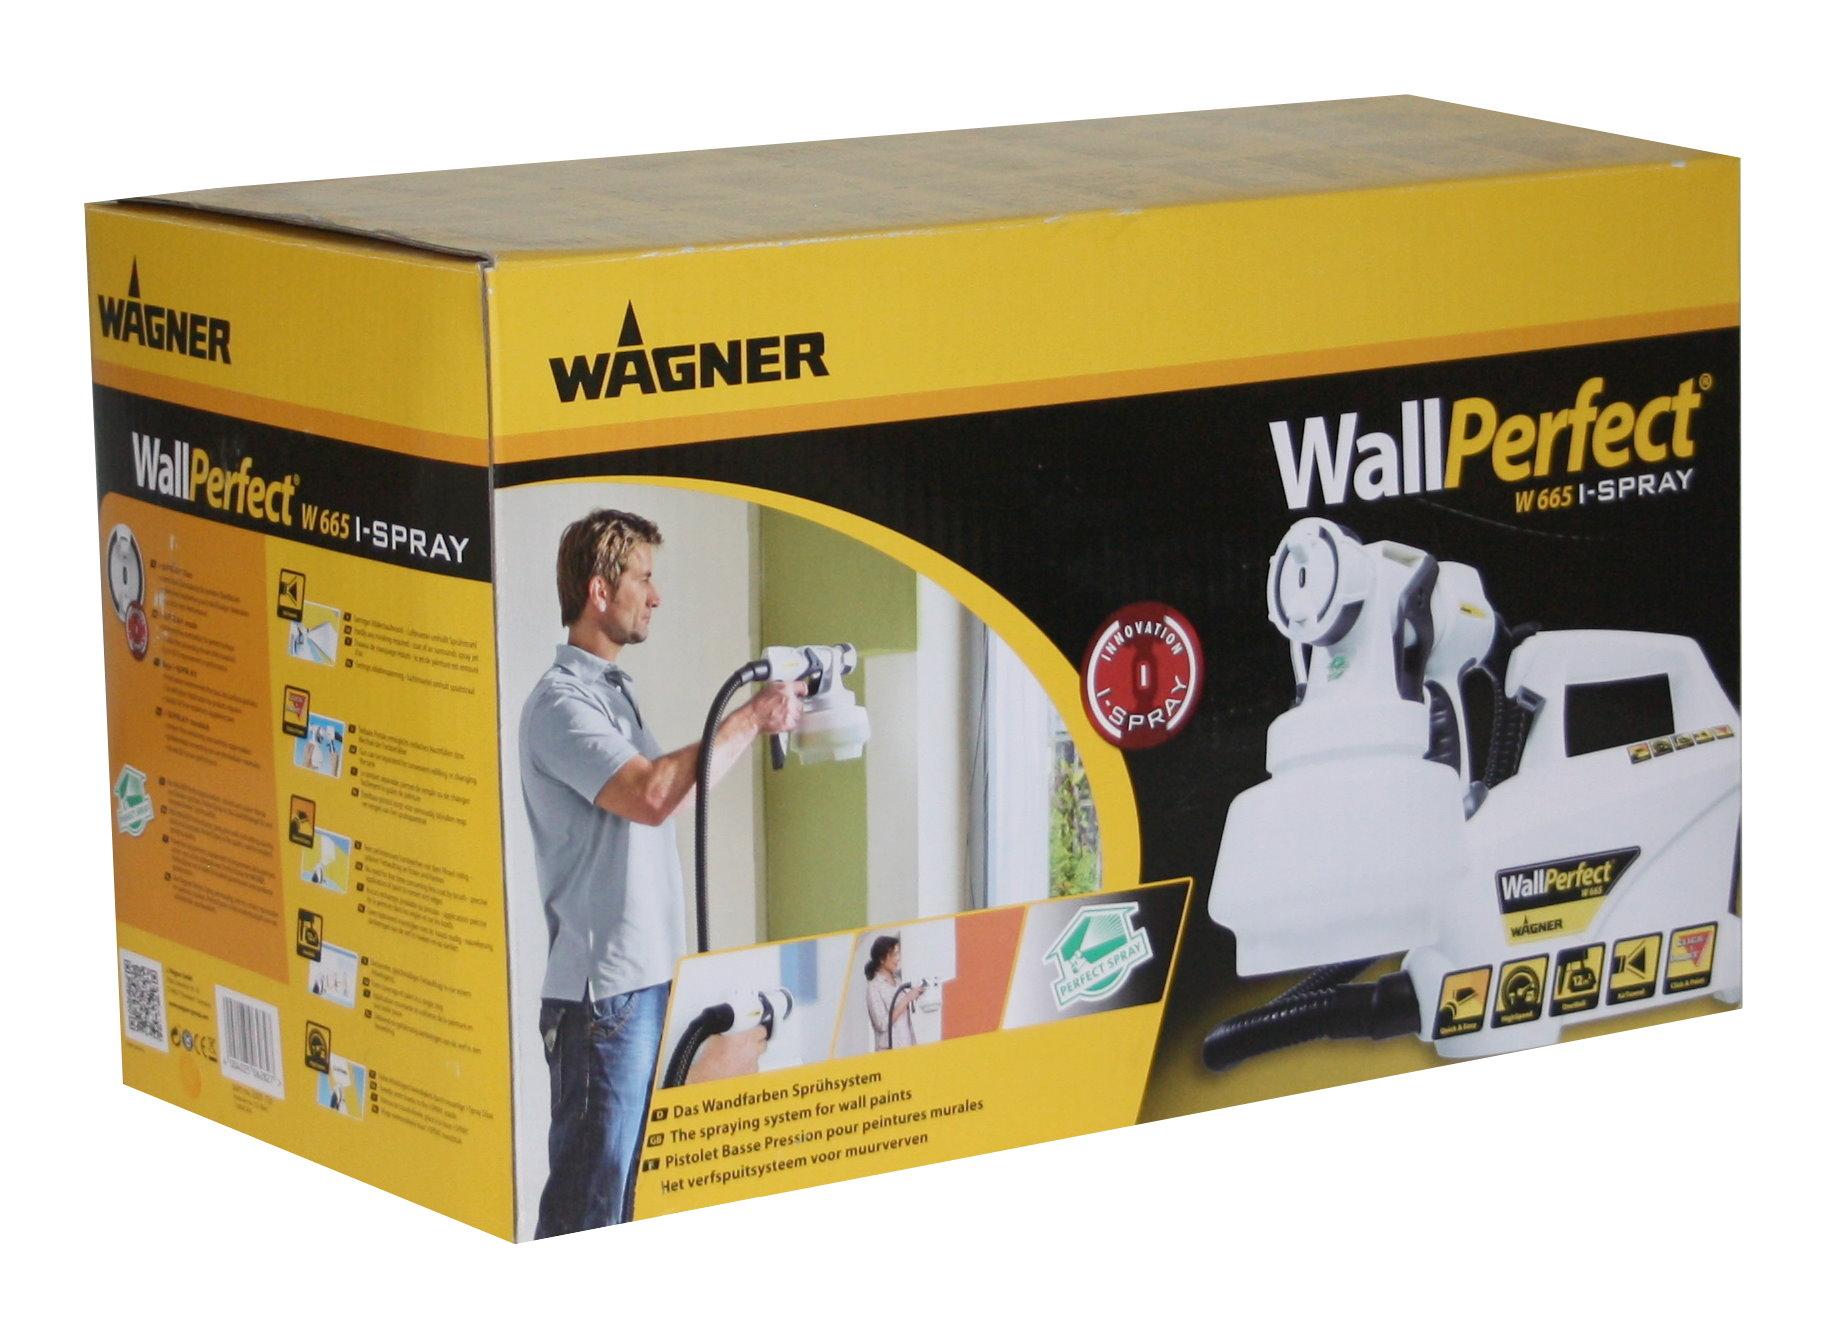 wagner wandfarbe farbspr hsystem w665 farbspr hger t spr haufsatz 1800ml ebay. Black Bedroom Furniture Sets. Home Design Ideas